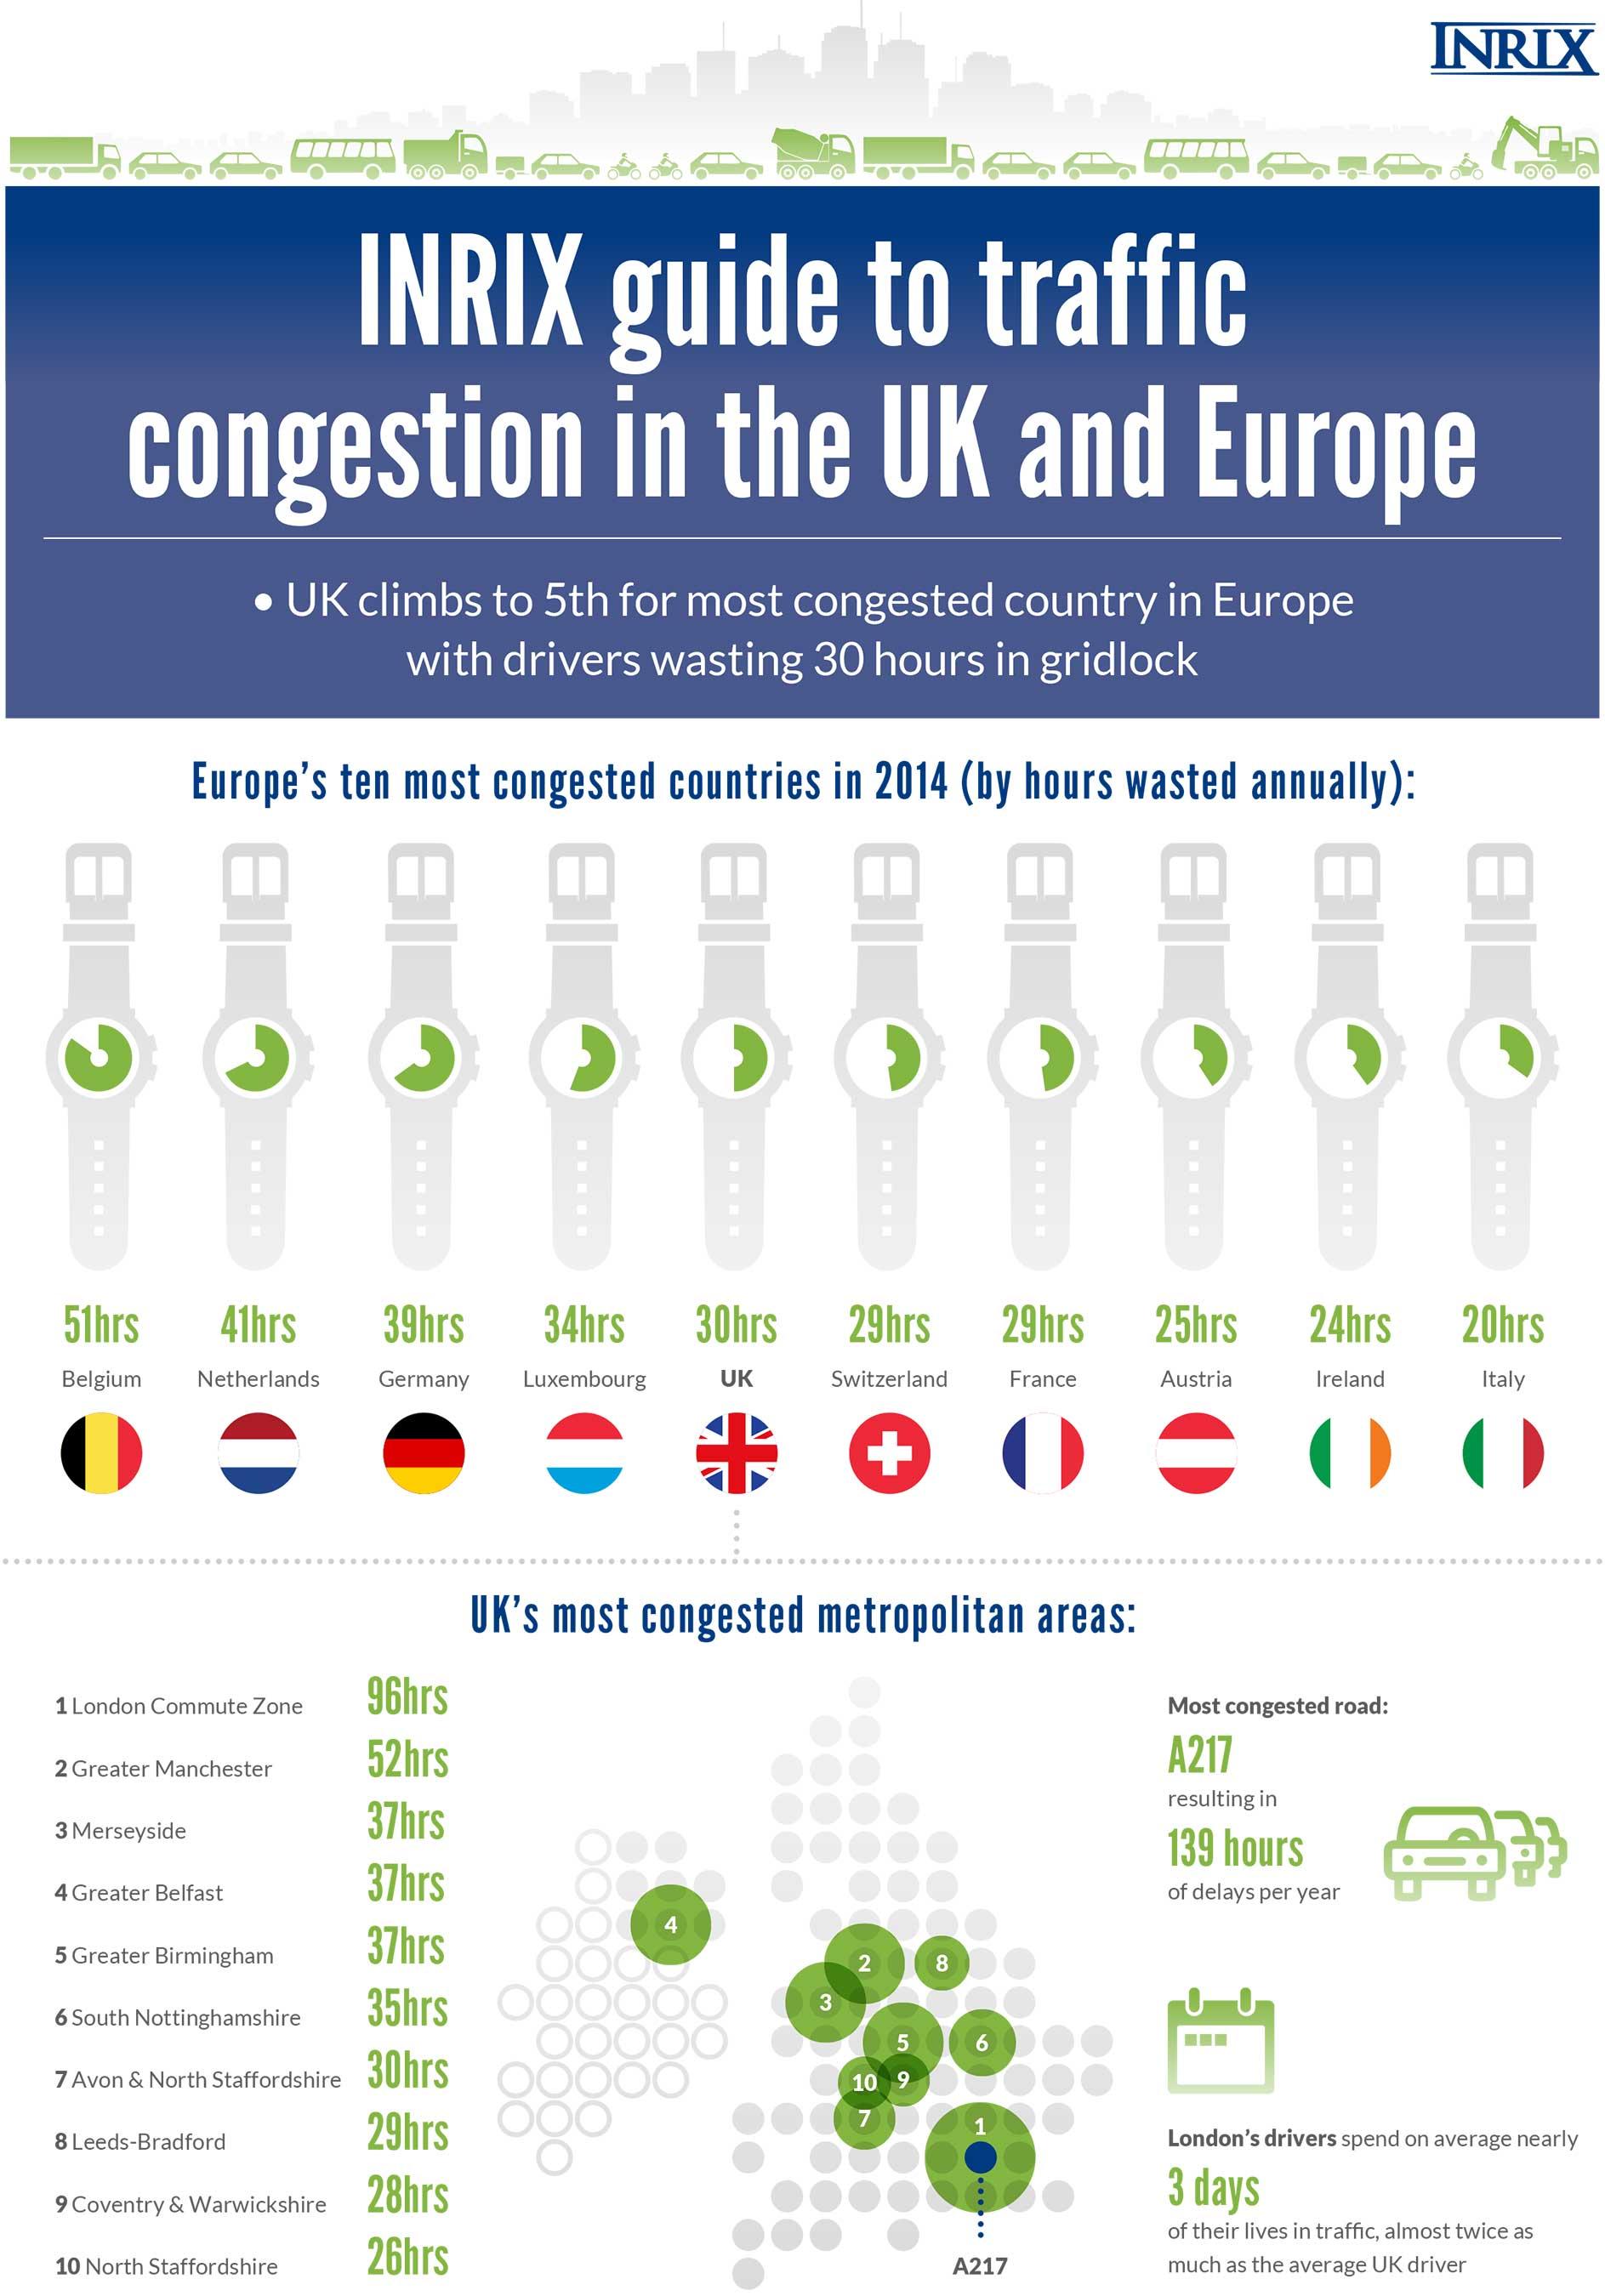 U.K. Traffic Infographic